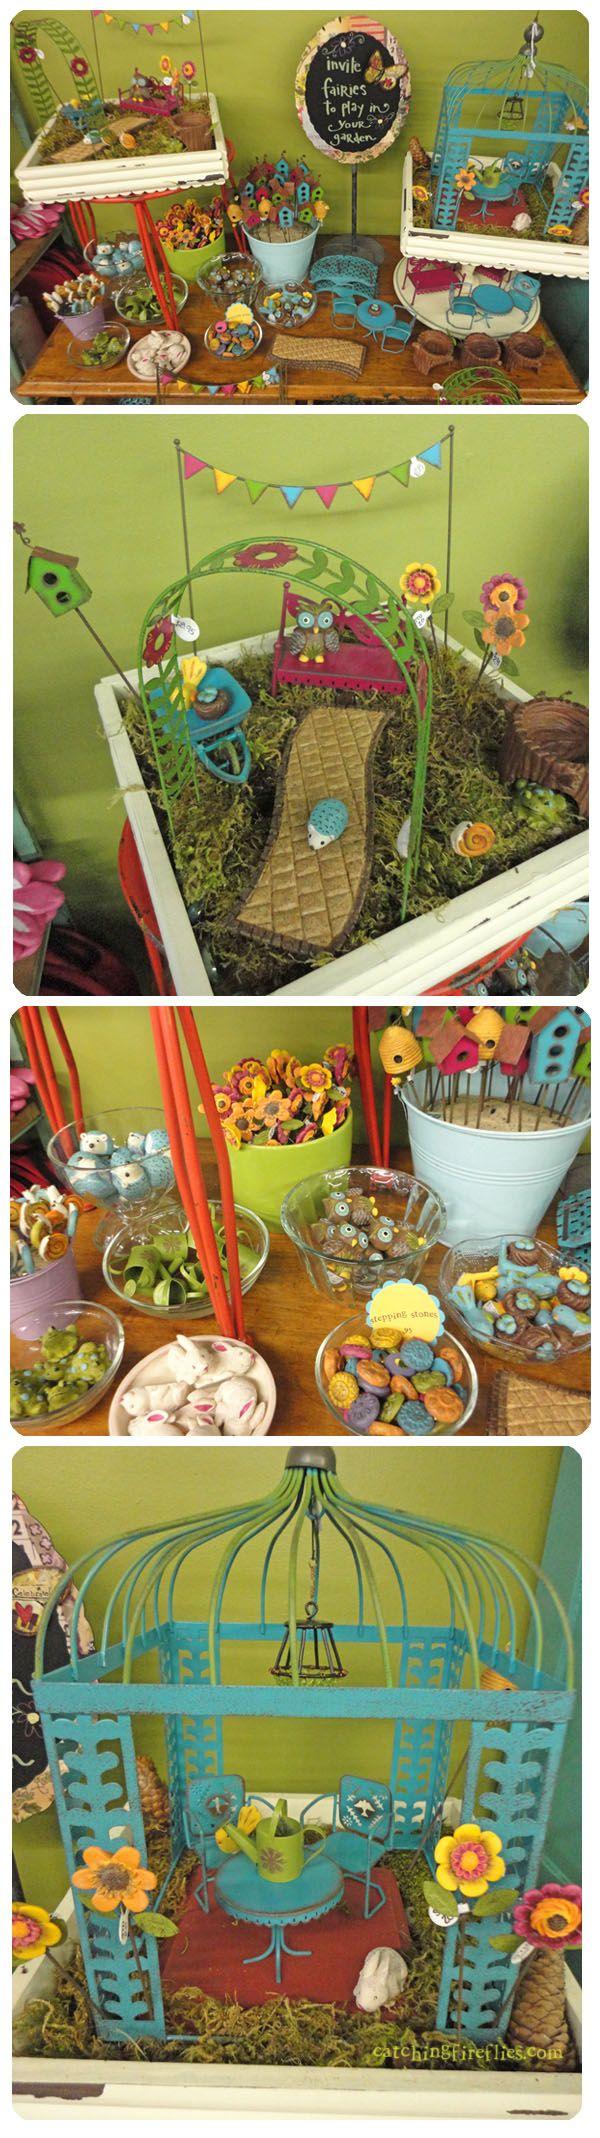 17 Best ideas about Fairy Garden Supplies on Pinterest Diy fairy